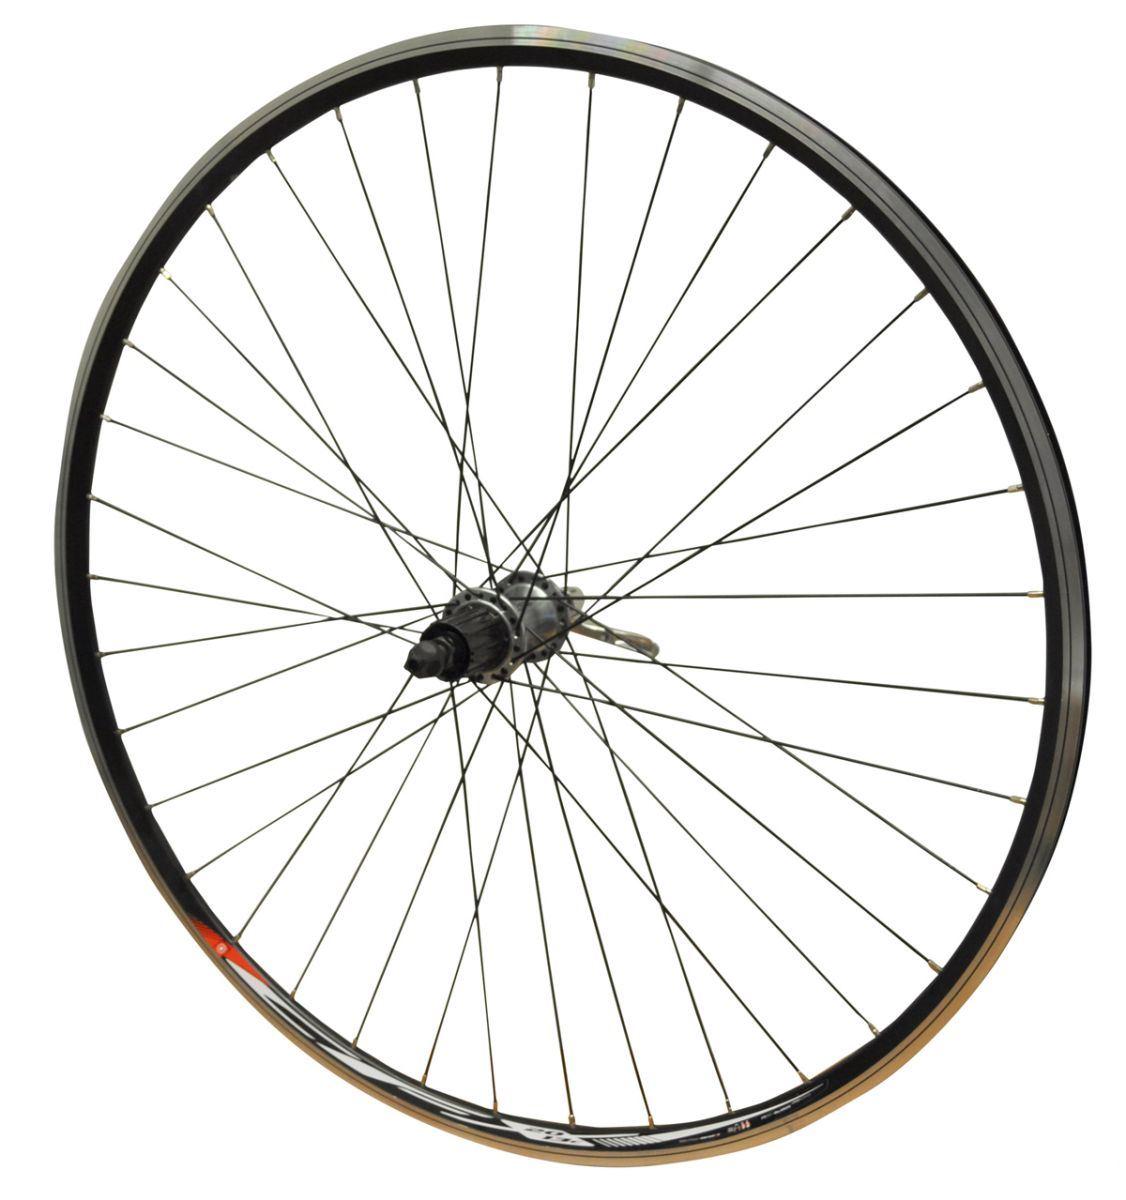 700c ROAD Bike Racer Wheel REAR Shimano Tiagra Hub Mach